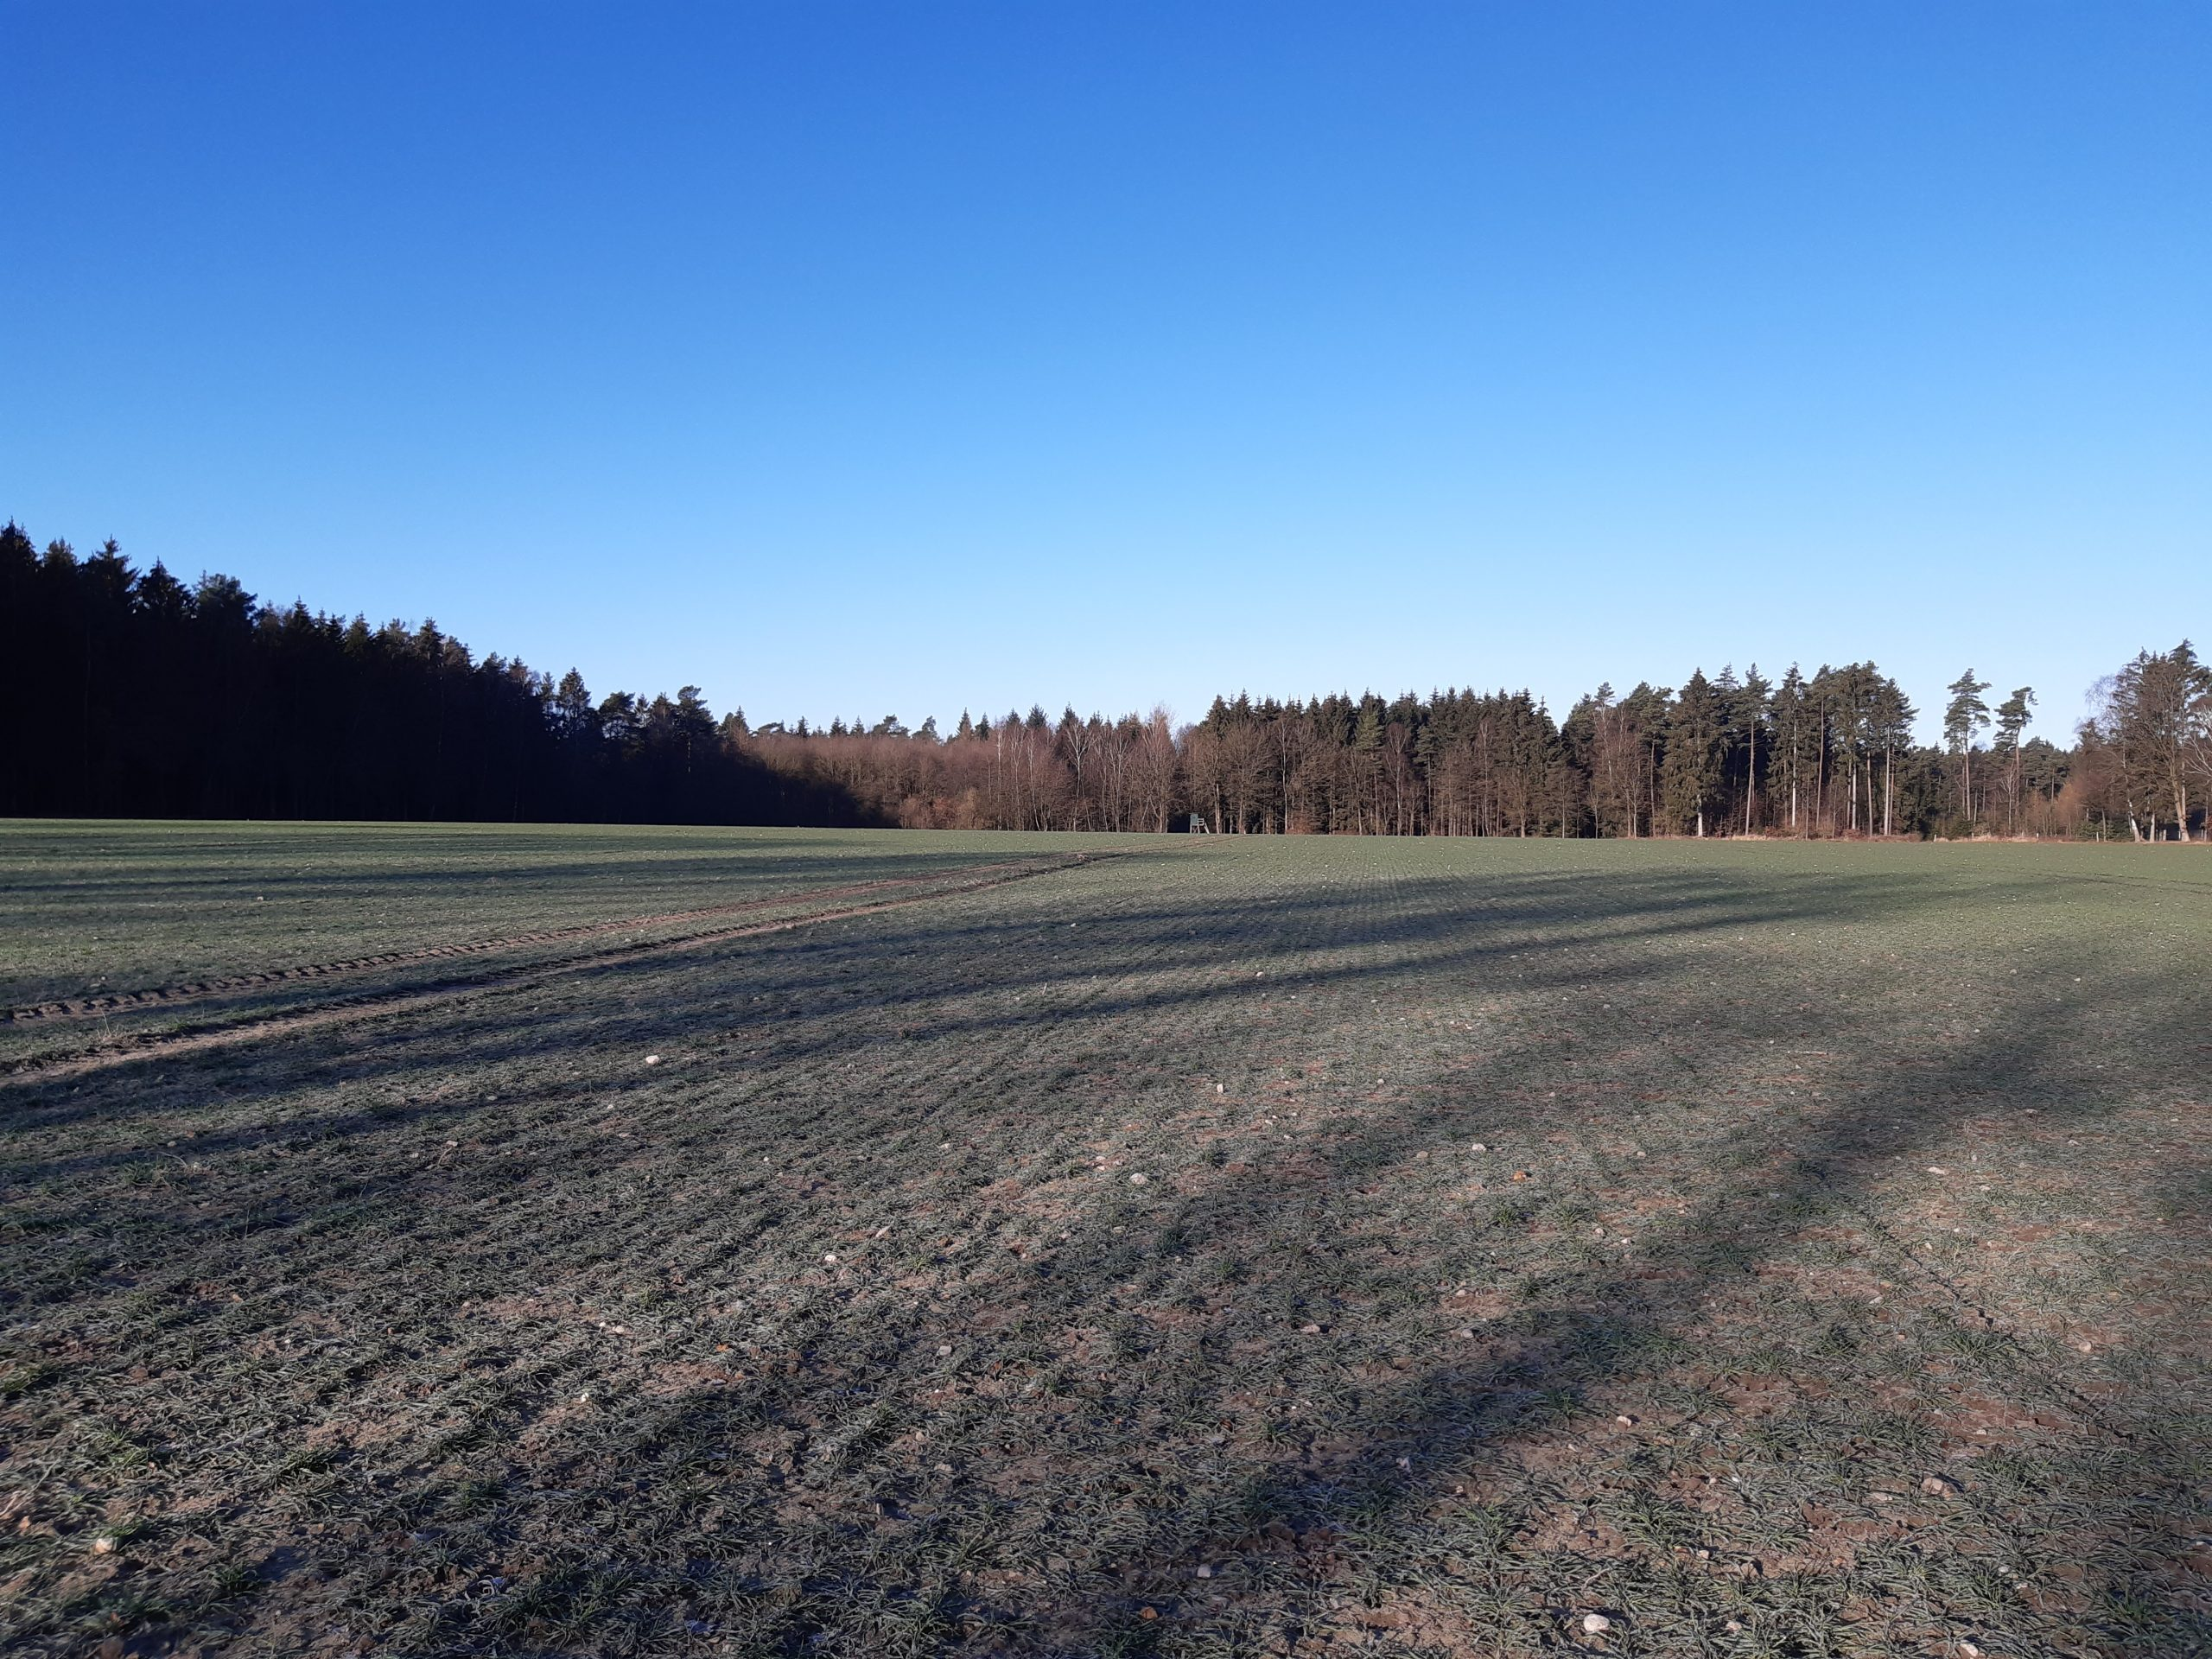 Maßnahmenfläche Schwesig 05.03.2021, Foto: KÖN